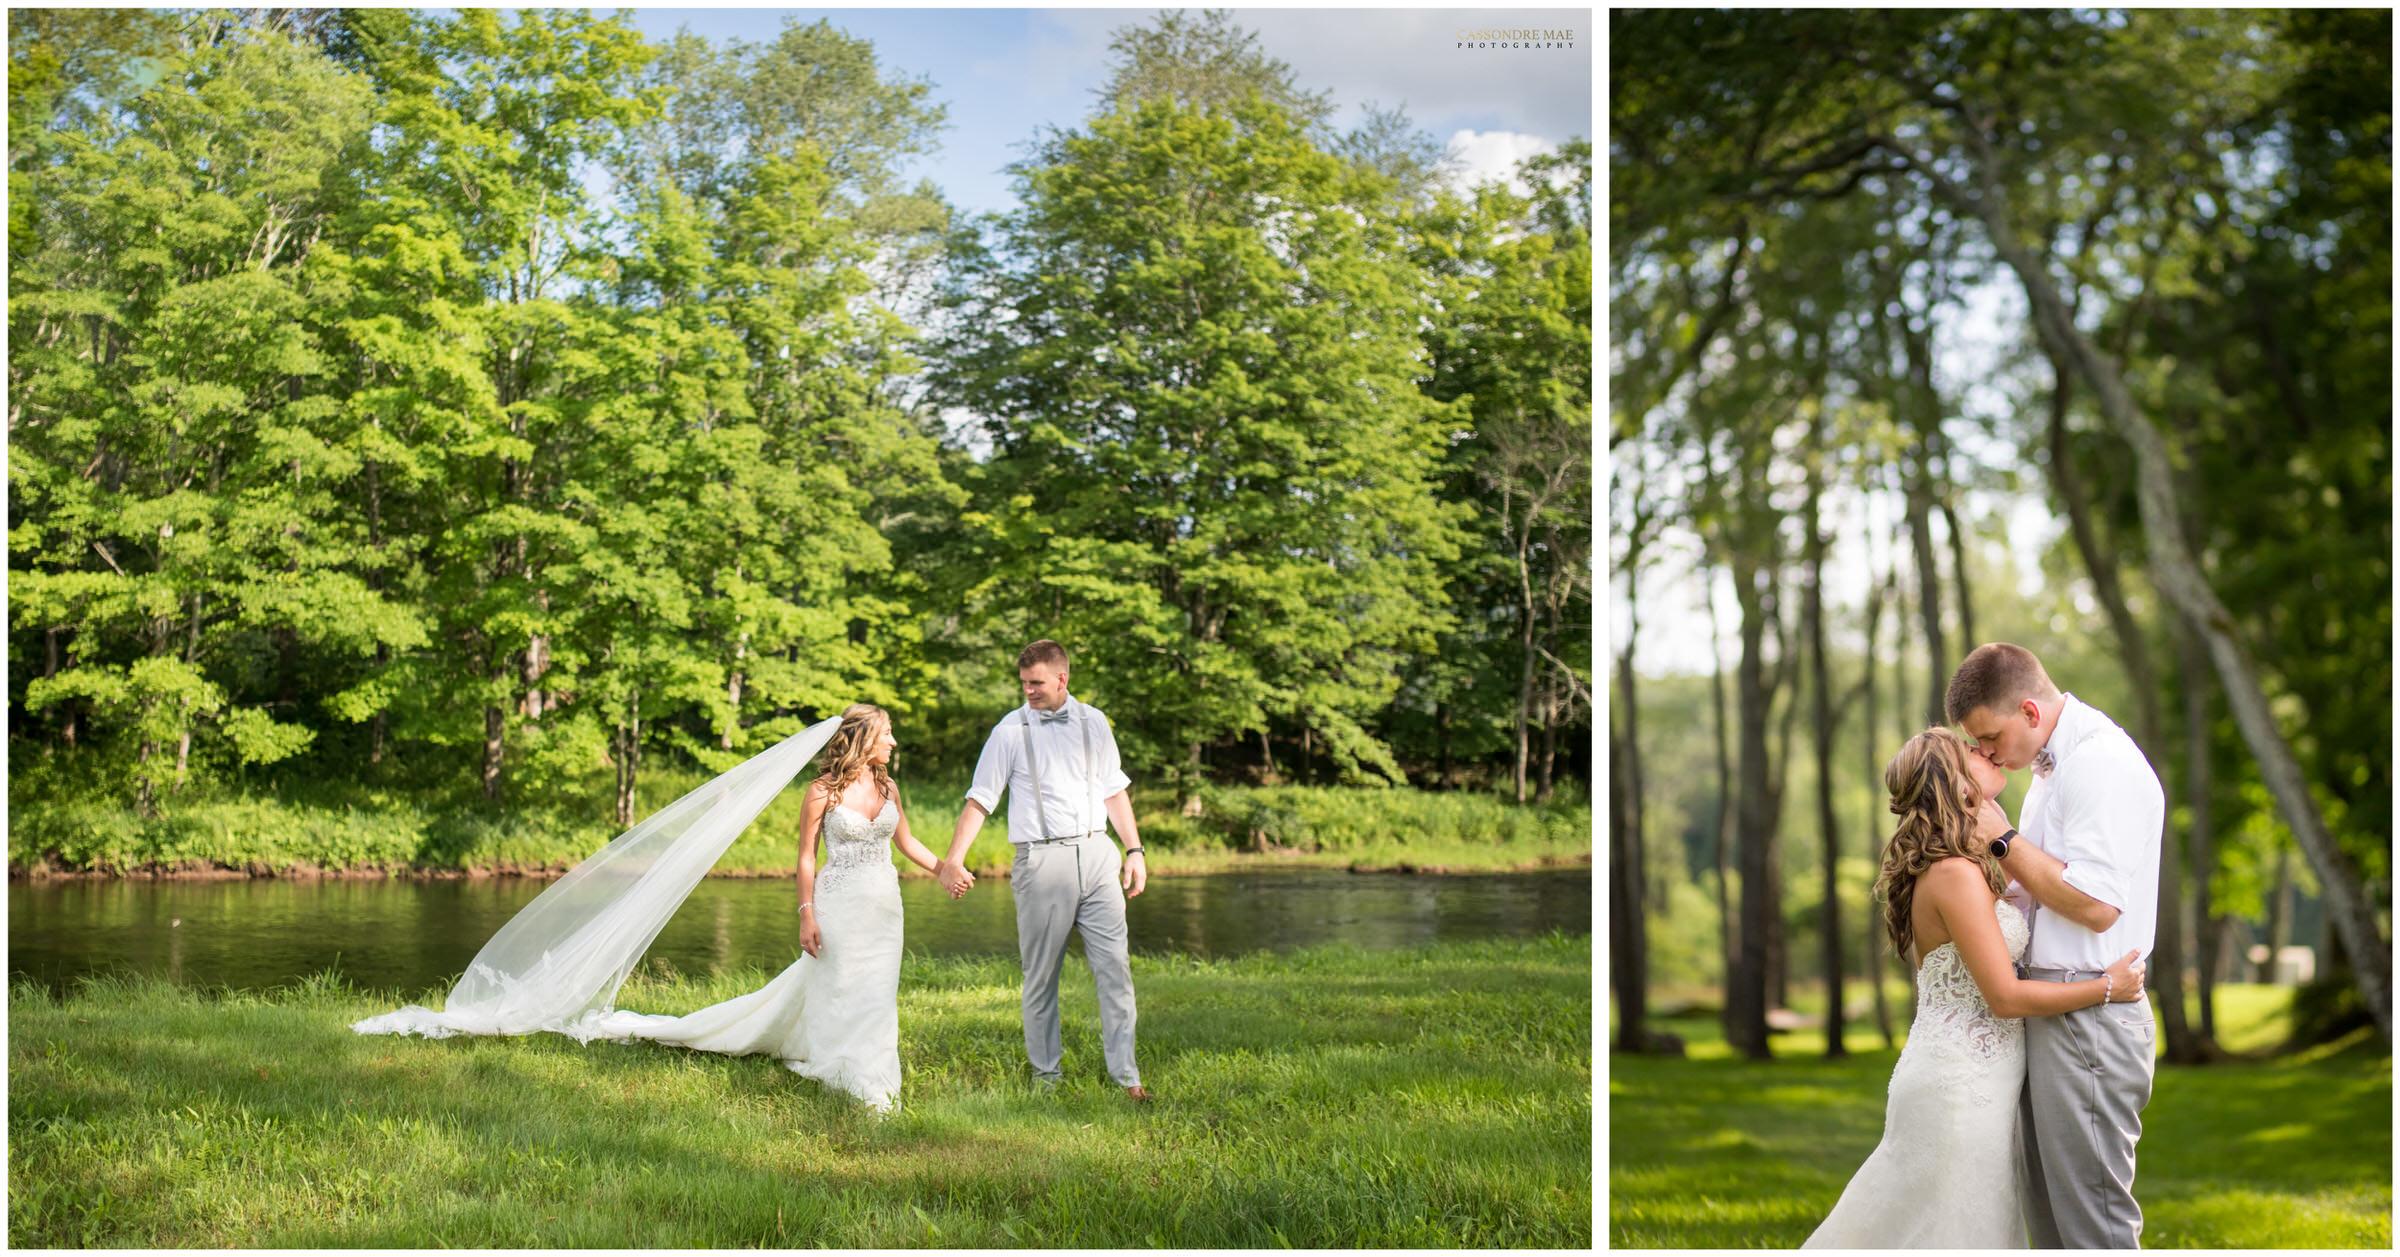 Cassondre Mae Photography Hudson Valley Wedding 27.jpg